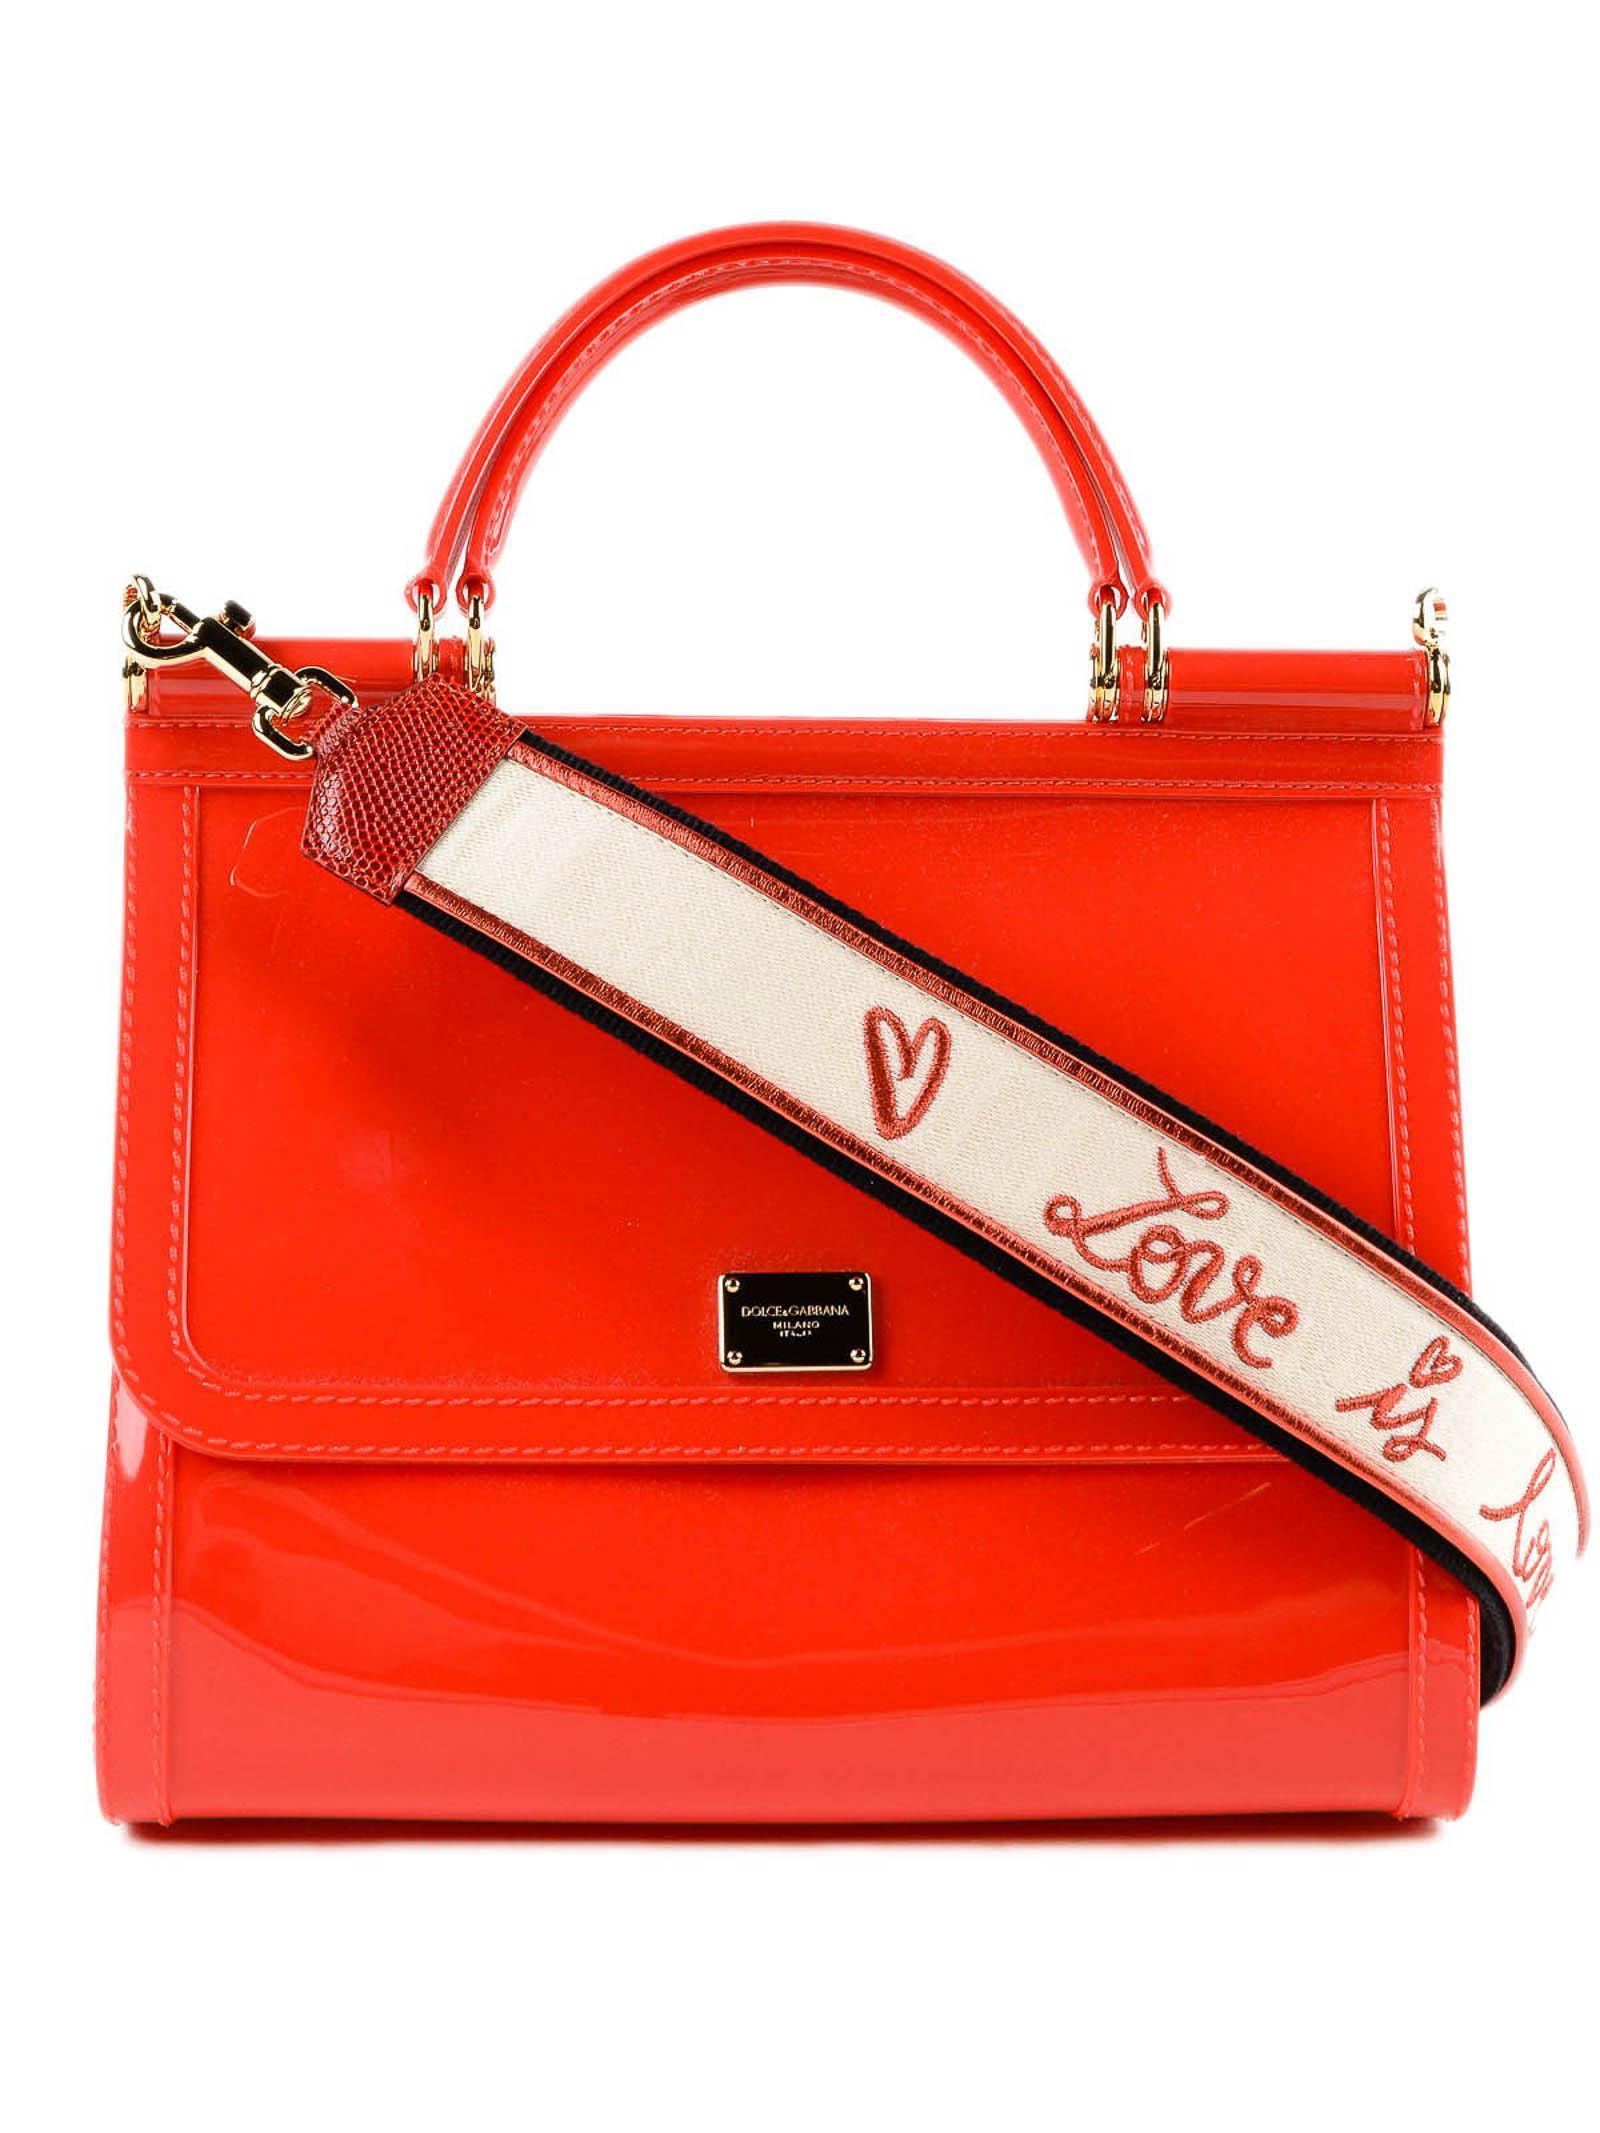 f2a2f84da63 ... low priced 78179 19ff8 Dolce Gabbana. Womens Red Rubber Handbag ...